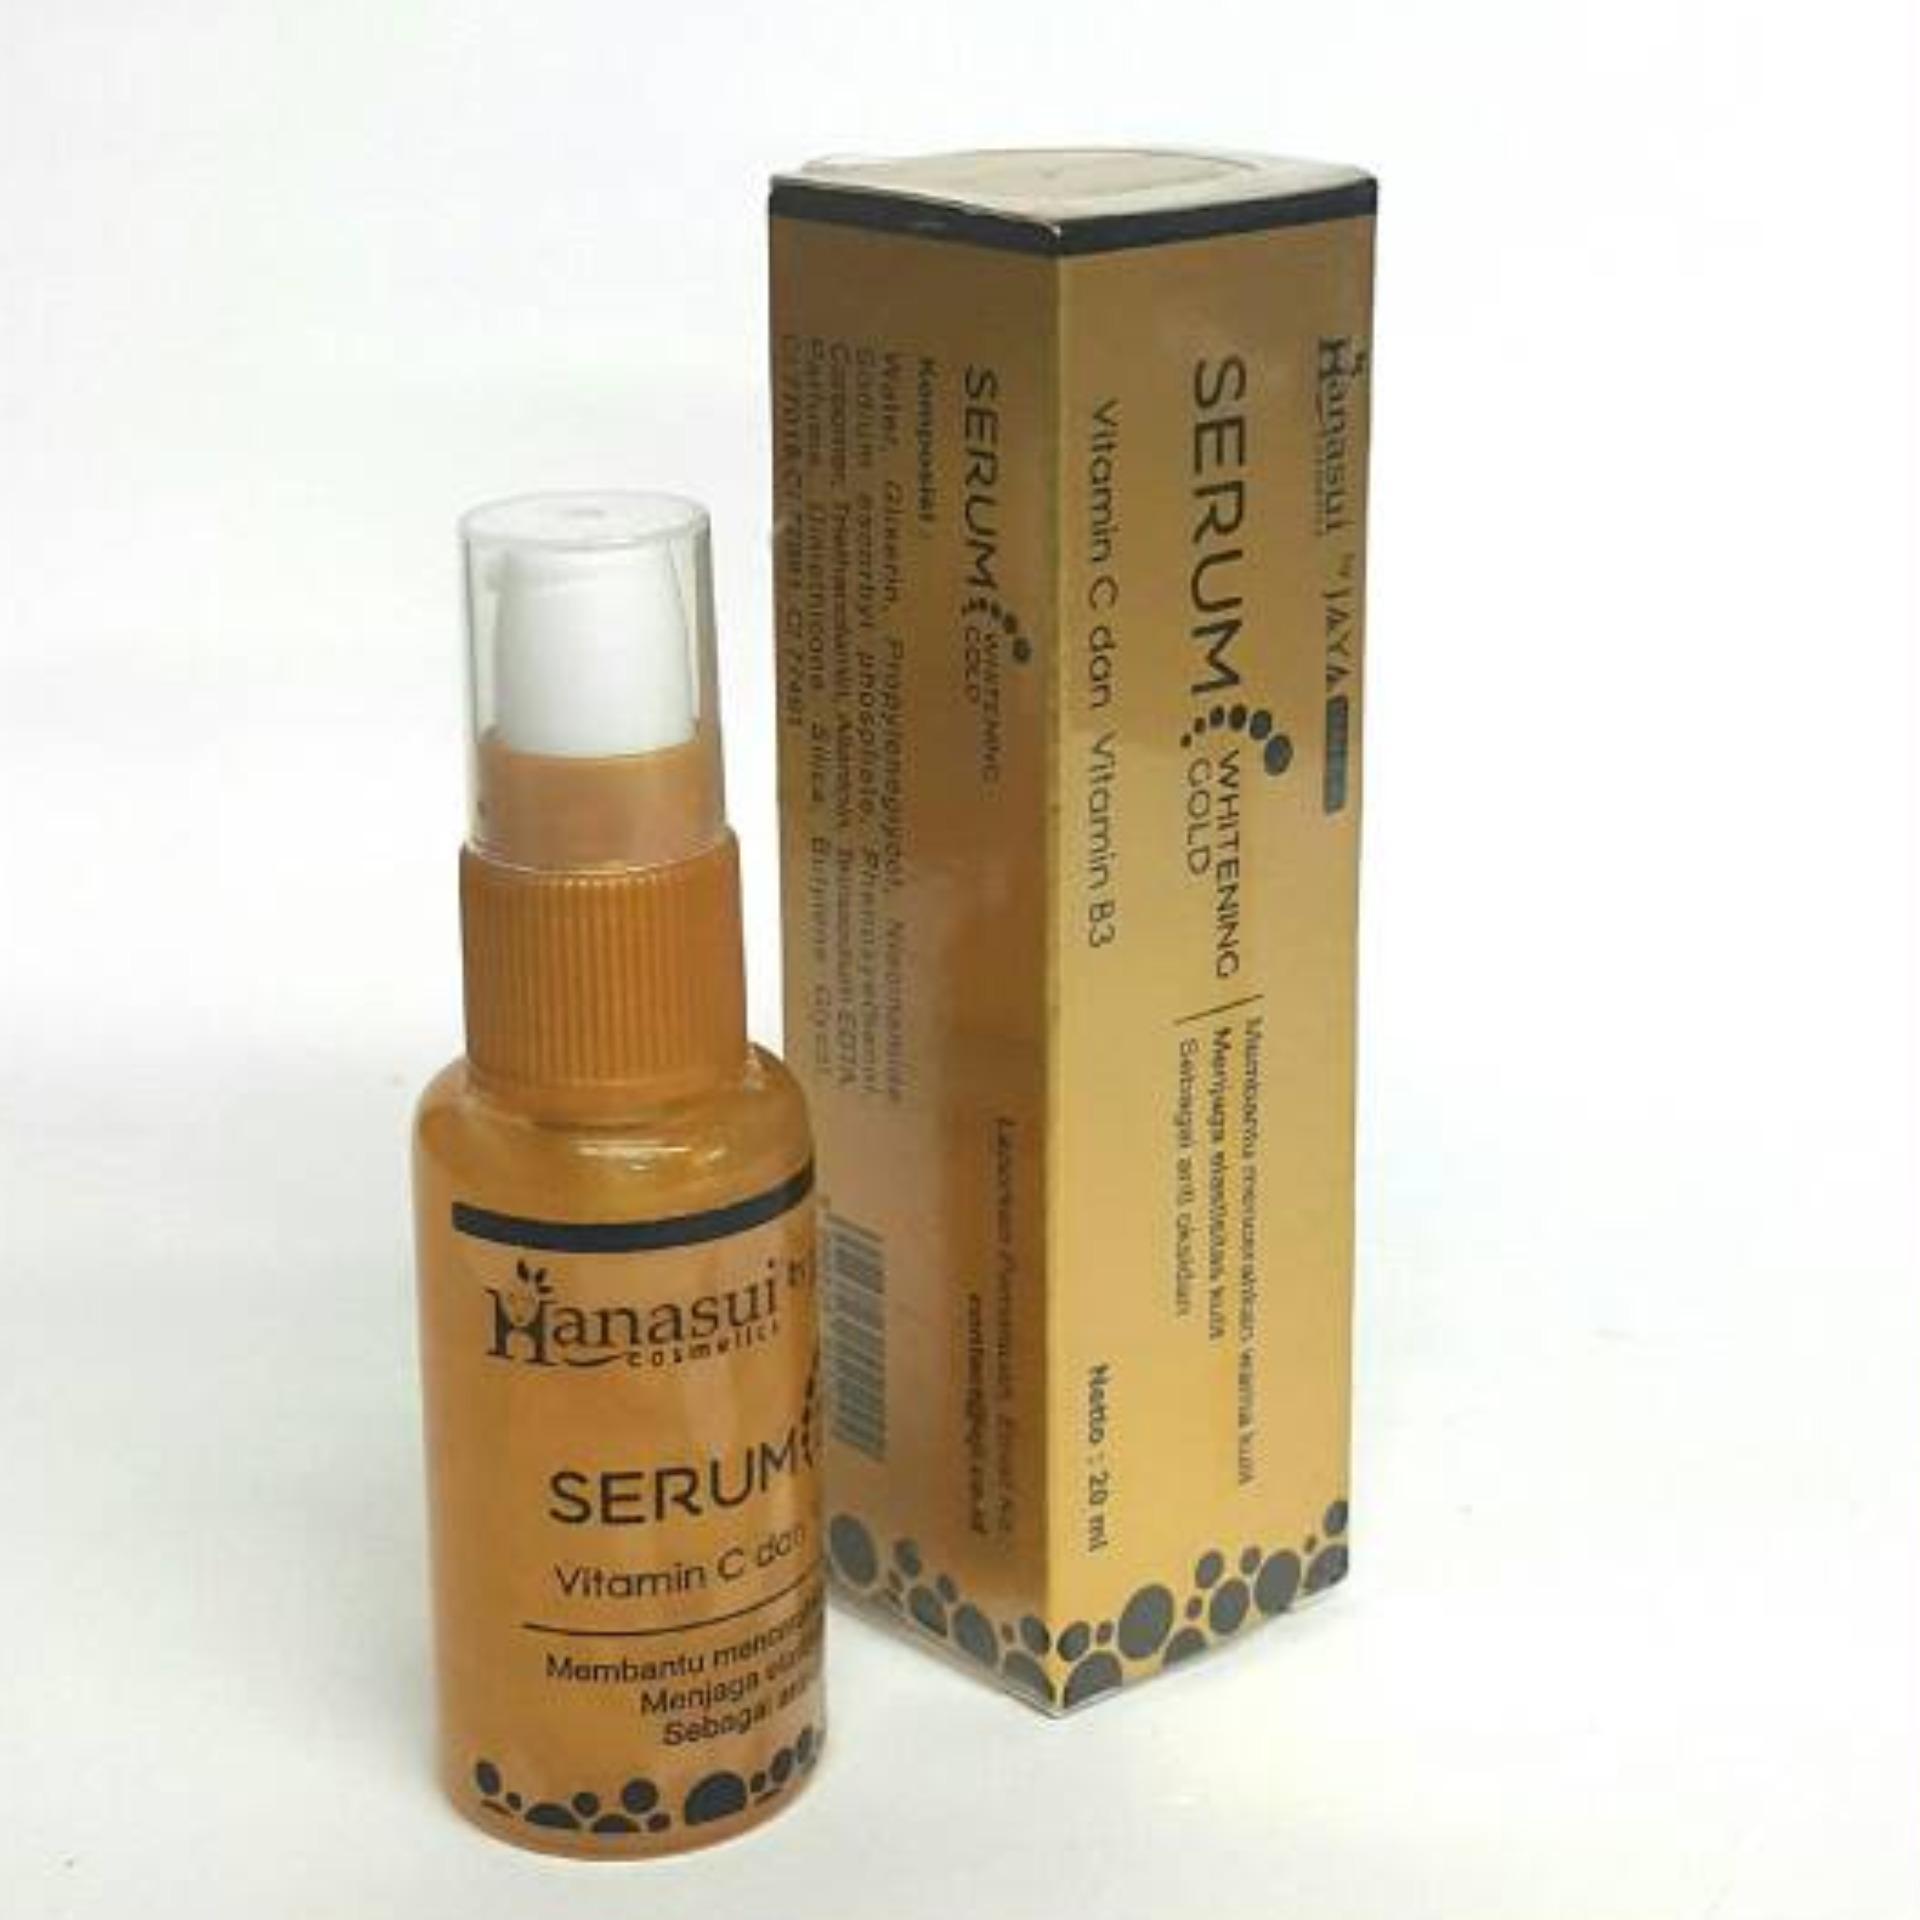 Hanasui Jaya Mandiri Bpom Paket Hemat Whitening Serum Gold Anti Acne Wajah Original